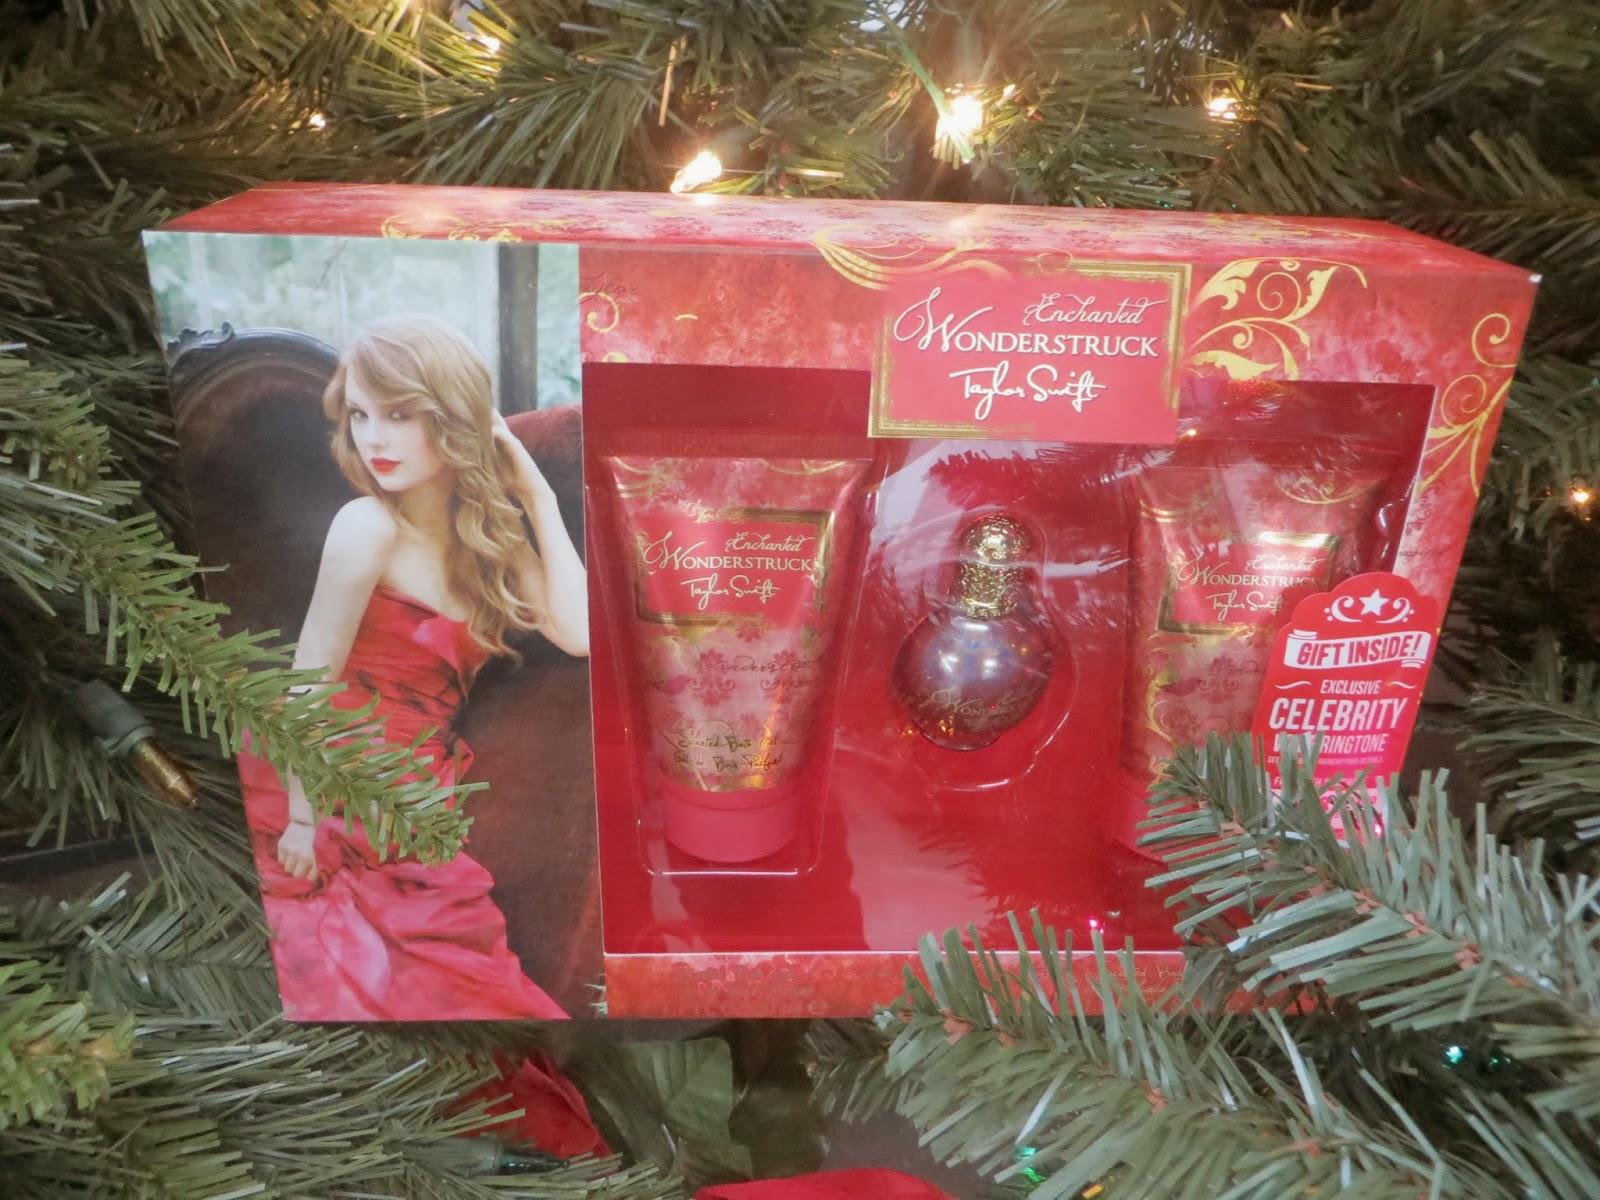 Elle sees beauty ger in atlanta christmas gift